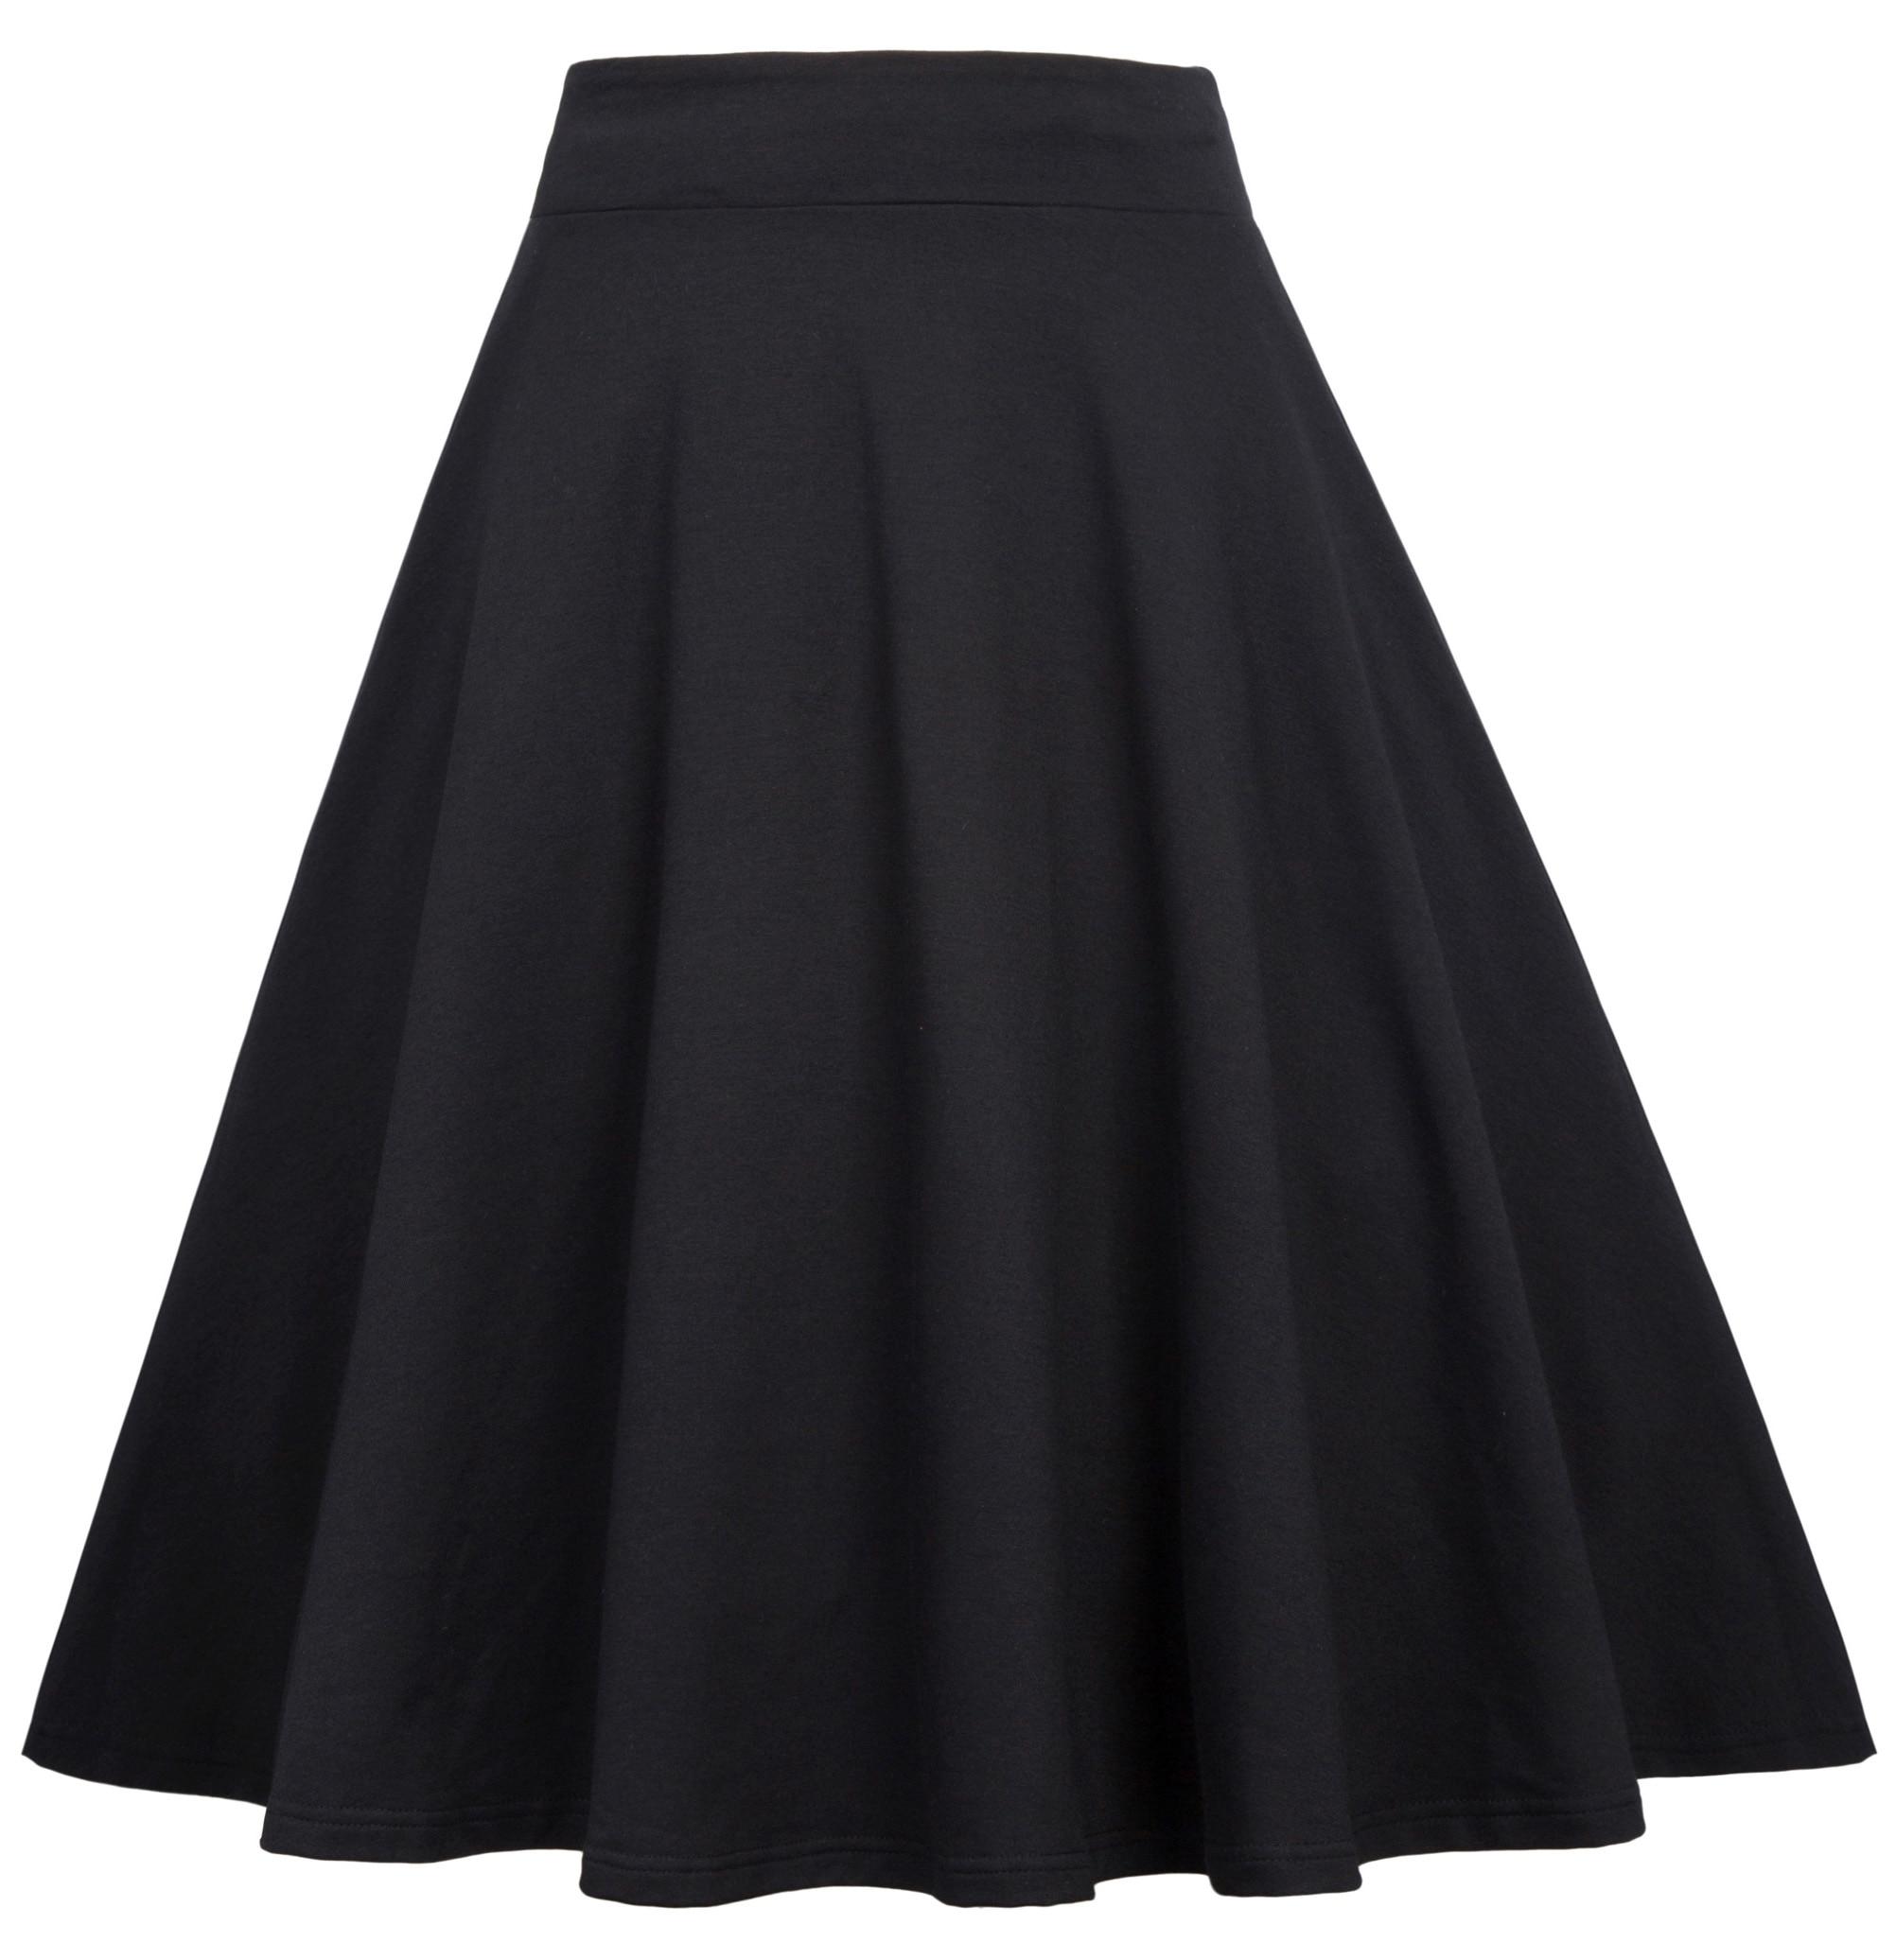 stock Women 90s retro Black skirt elegant Elastic Waist Stretchy Flared A-Line Skirts 27 japanese harajuku skirt saia plissada